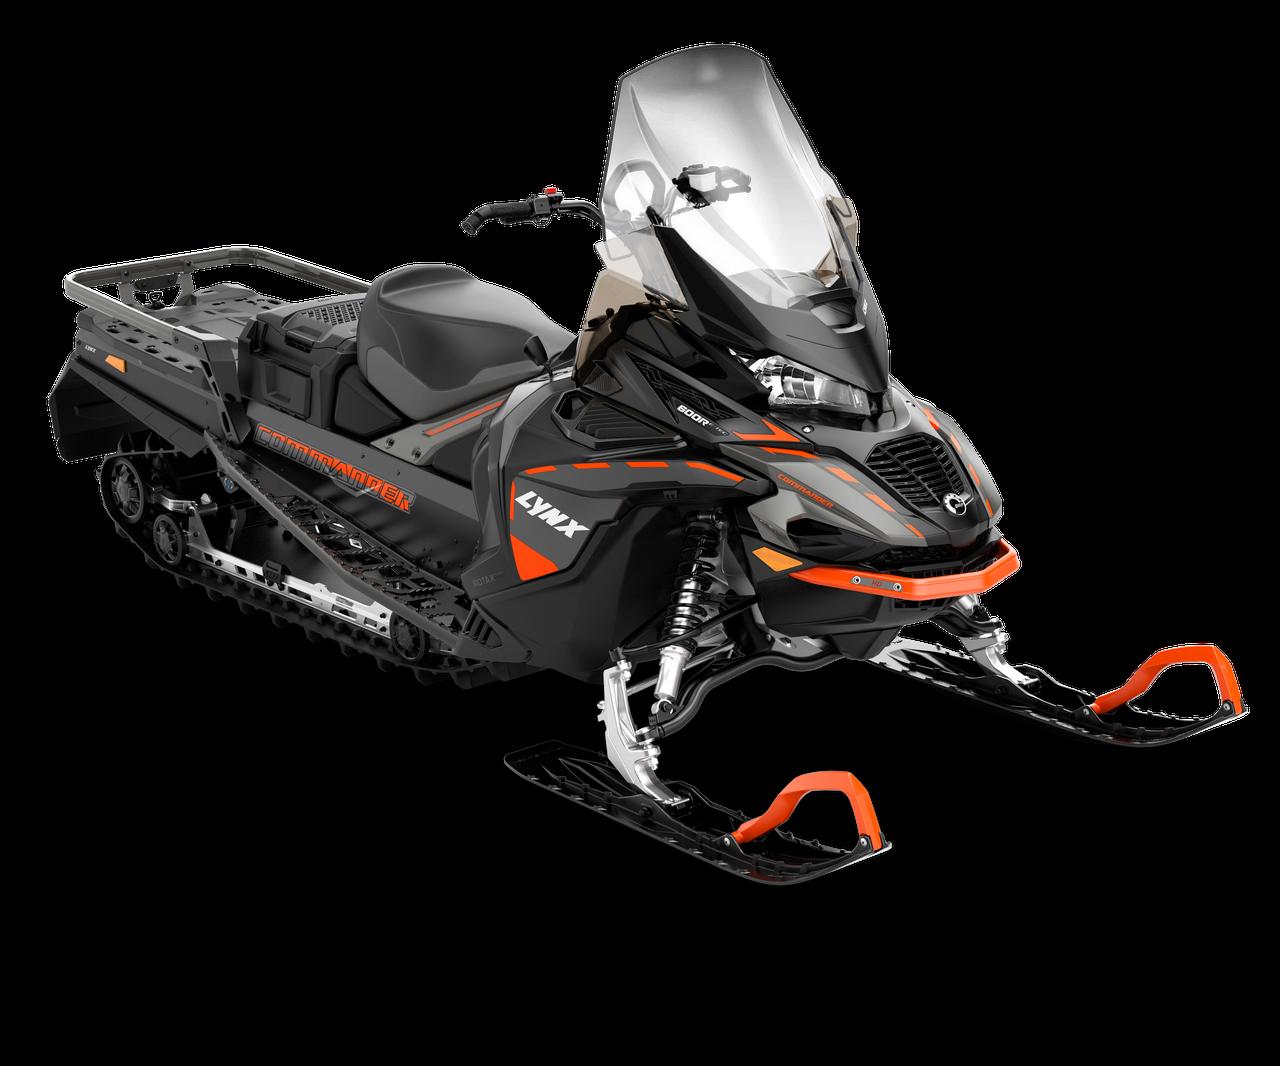 Снегоход Commander STD 900 ACE Черно-серый 2021